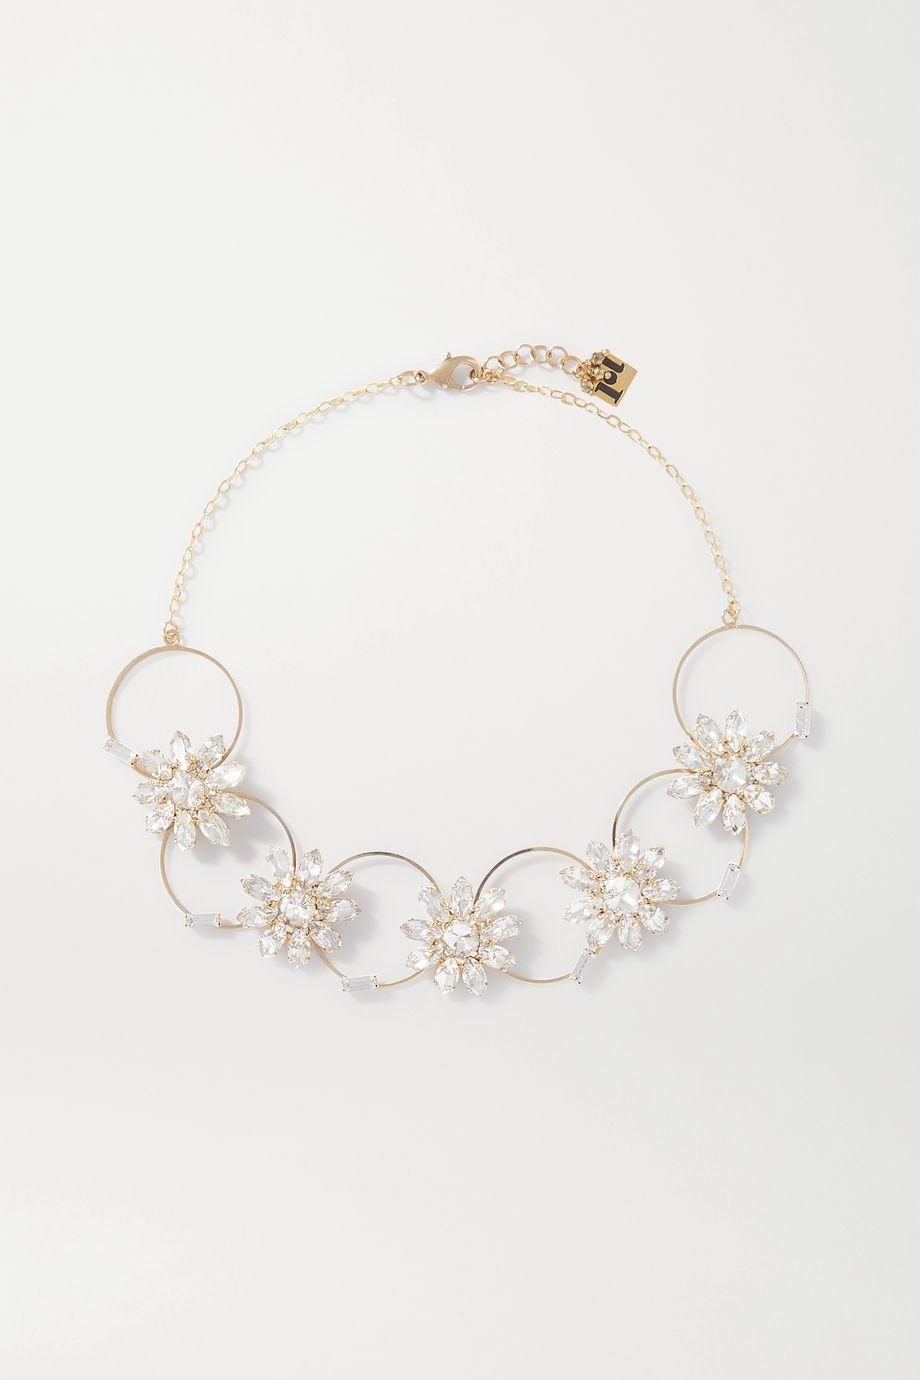 Rosantica Utopia gold-tone crystal necklace